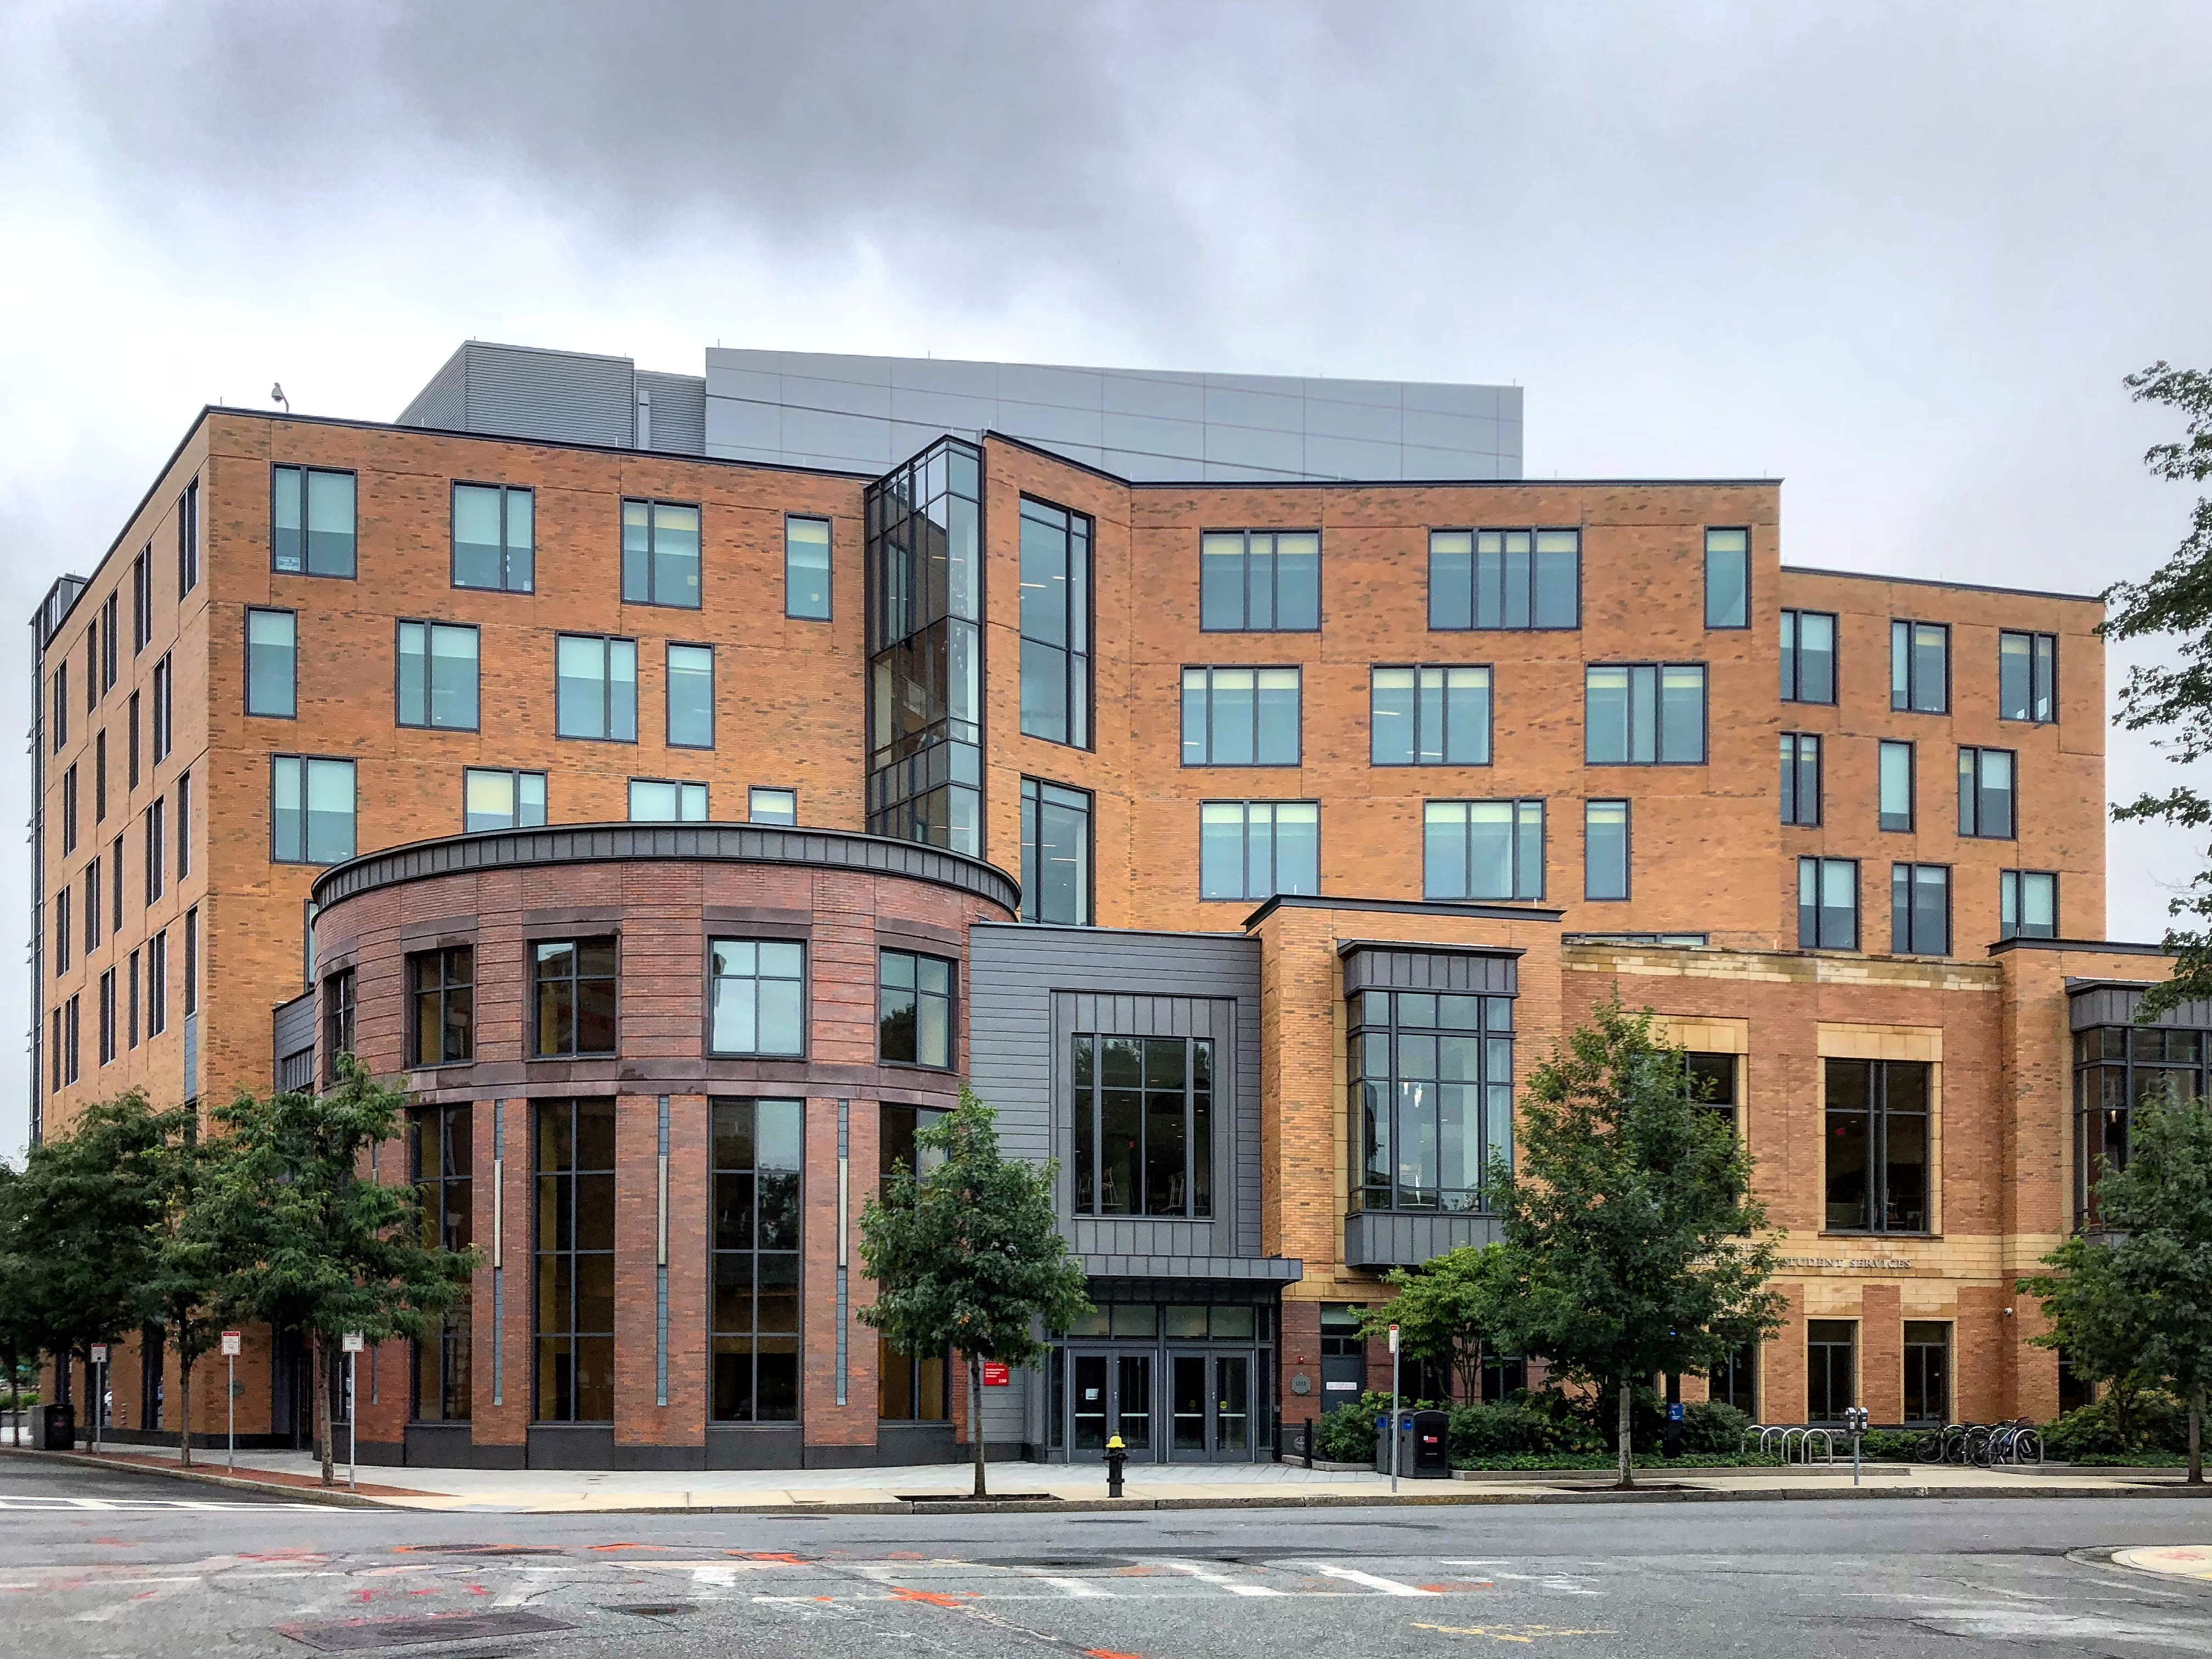 BU Student Service Center